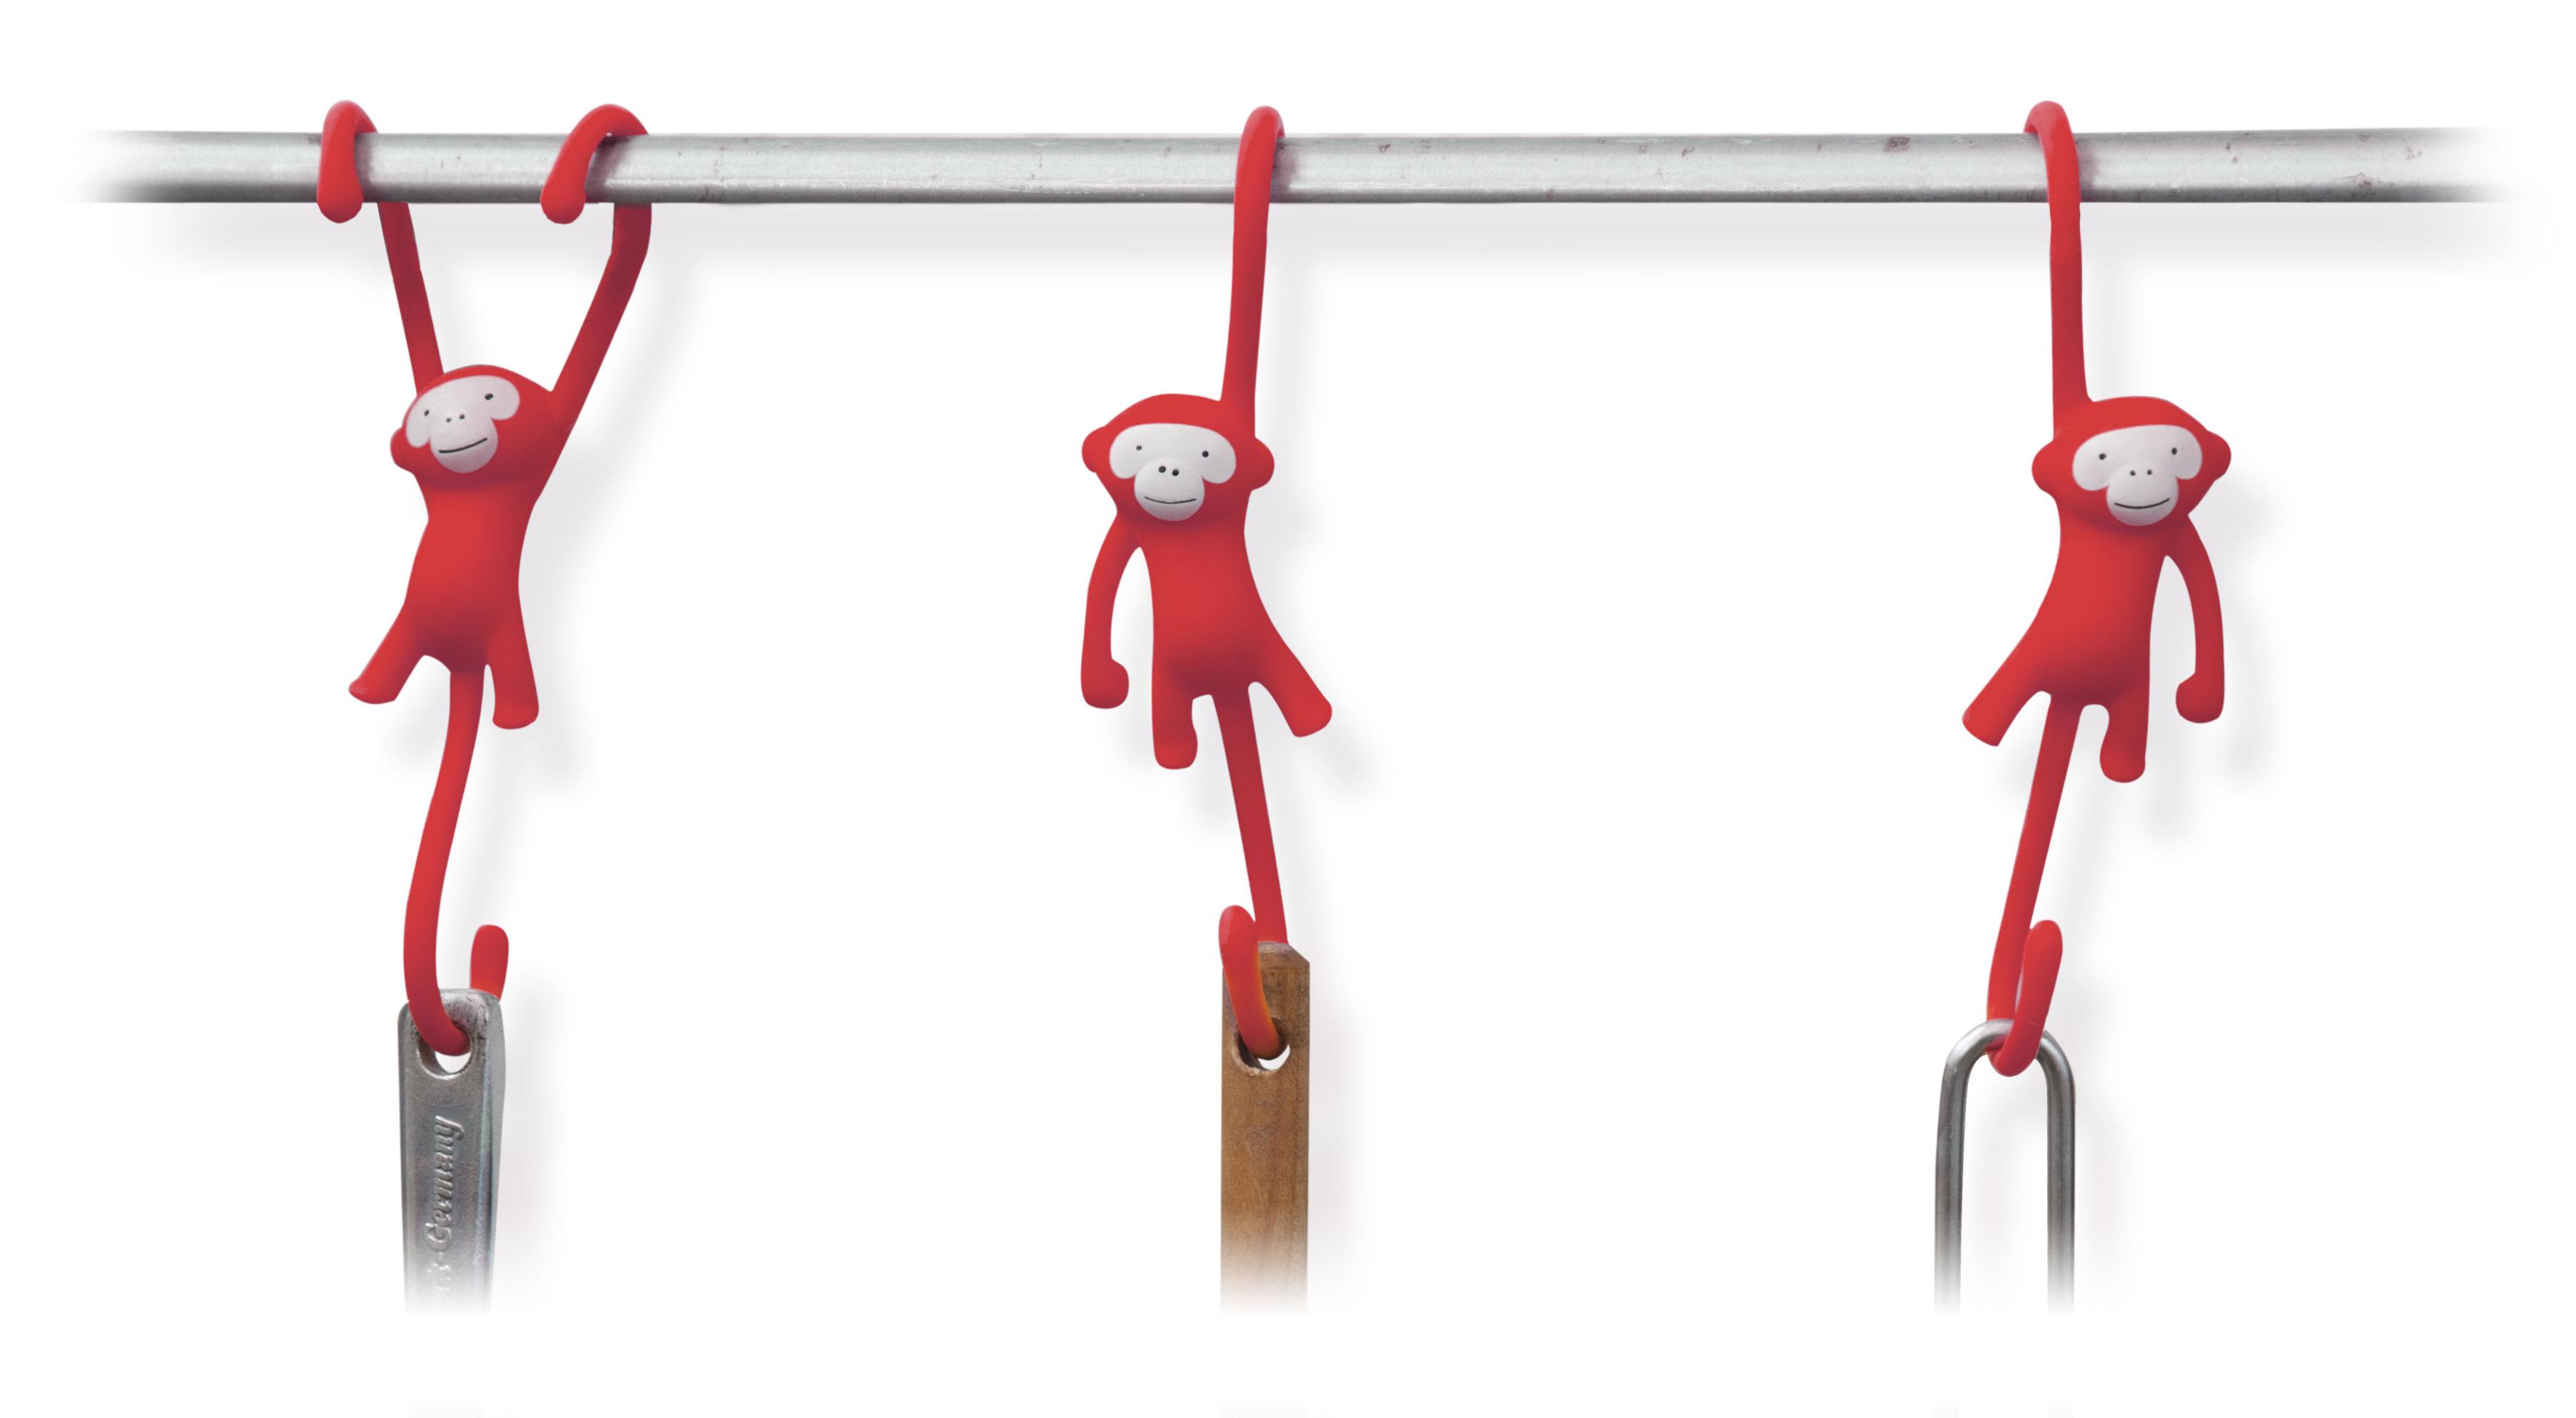 Accessoires - Accessoires für das Bad - Just hanging Haken / 3er-Set - Pa Design - Rot - Plastikmaterial